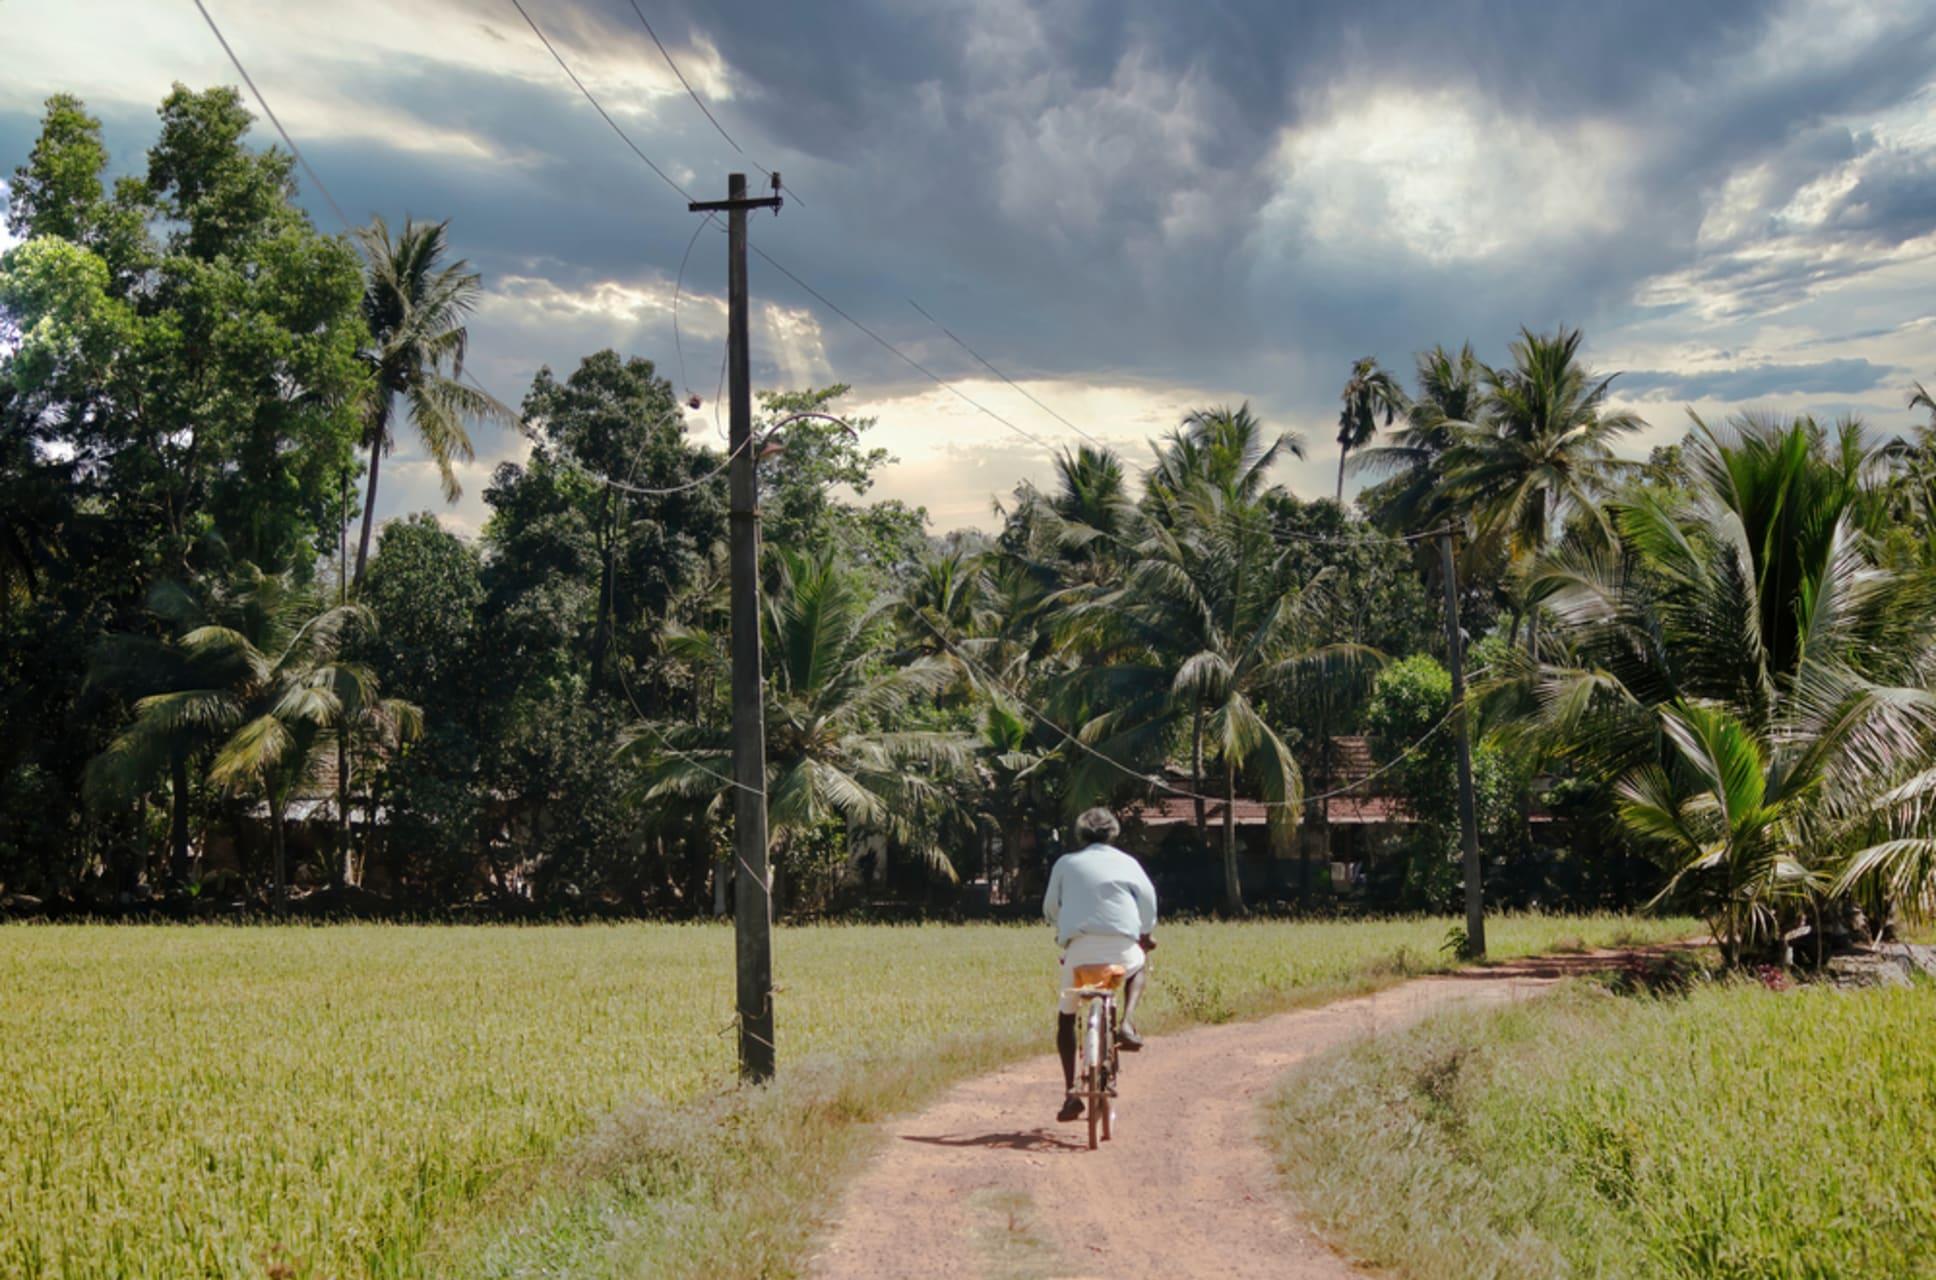 Kerala - Kerala; Bike ride through Riverside Town